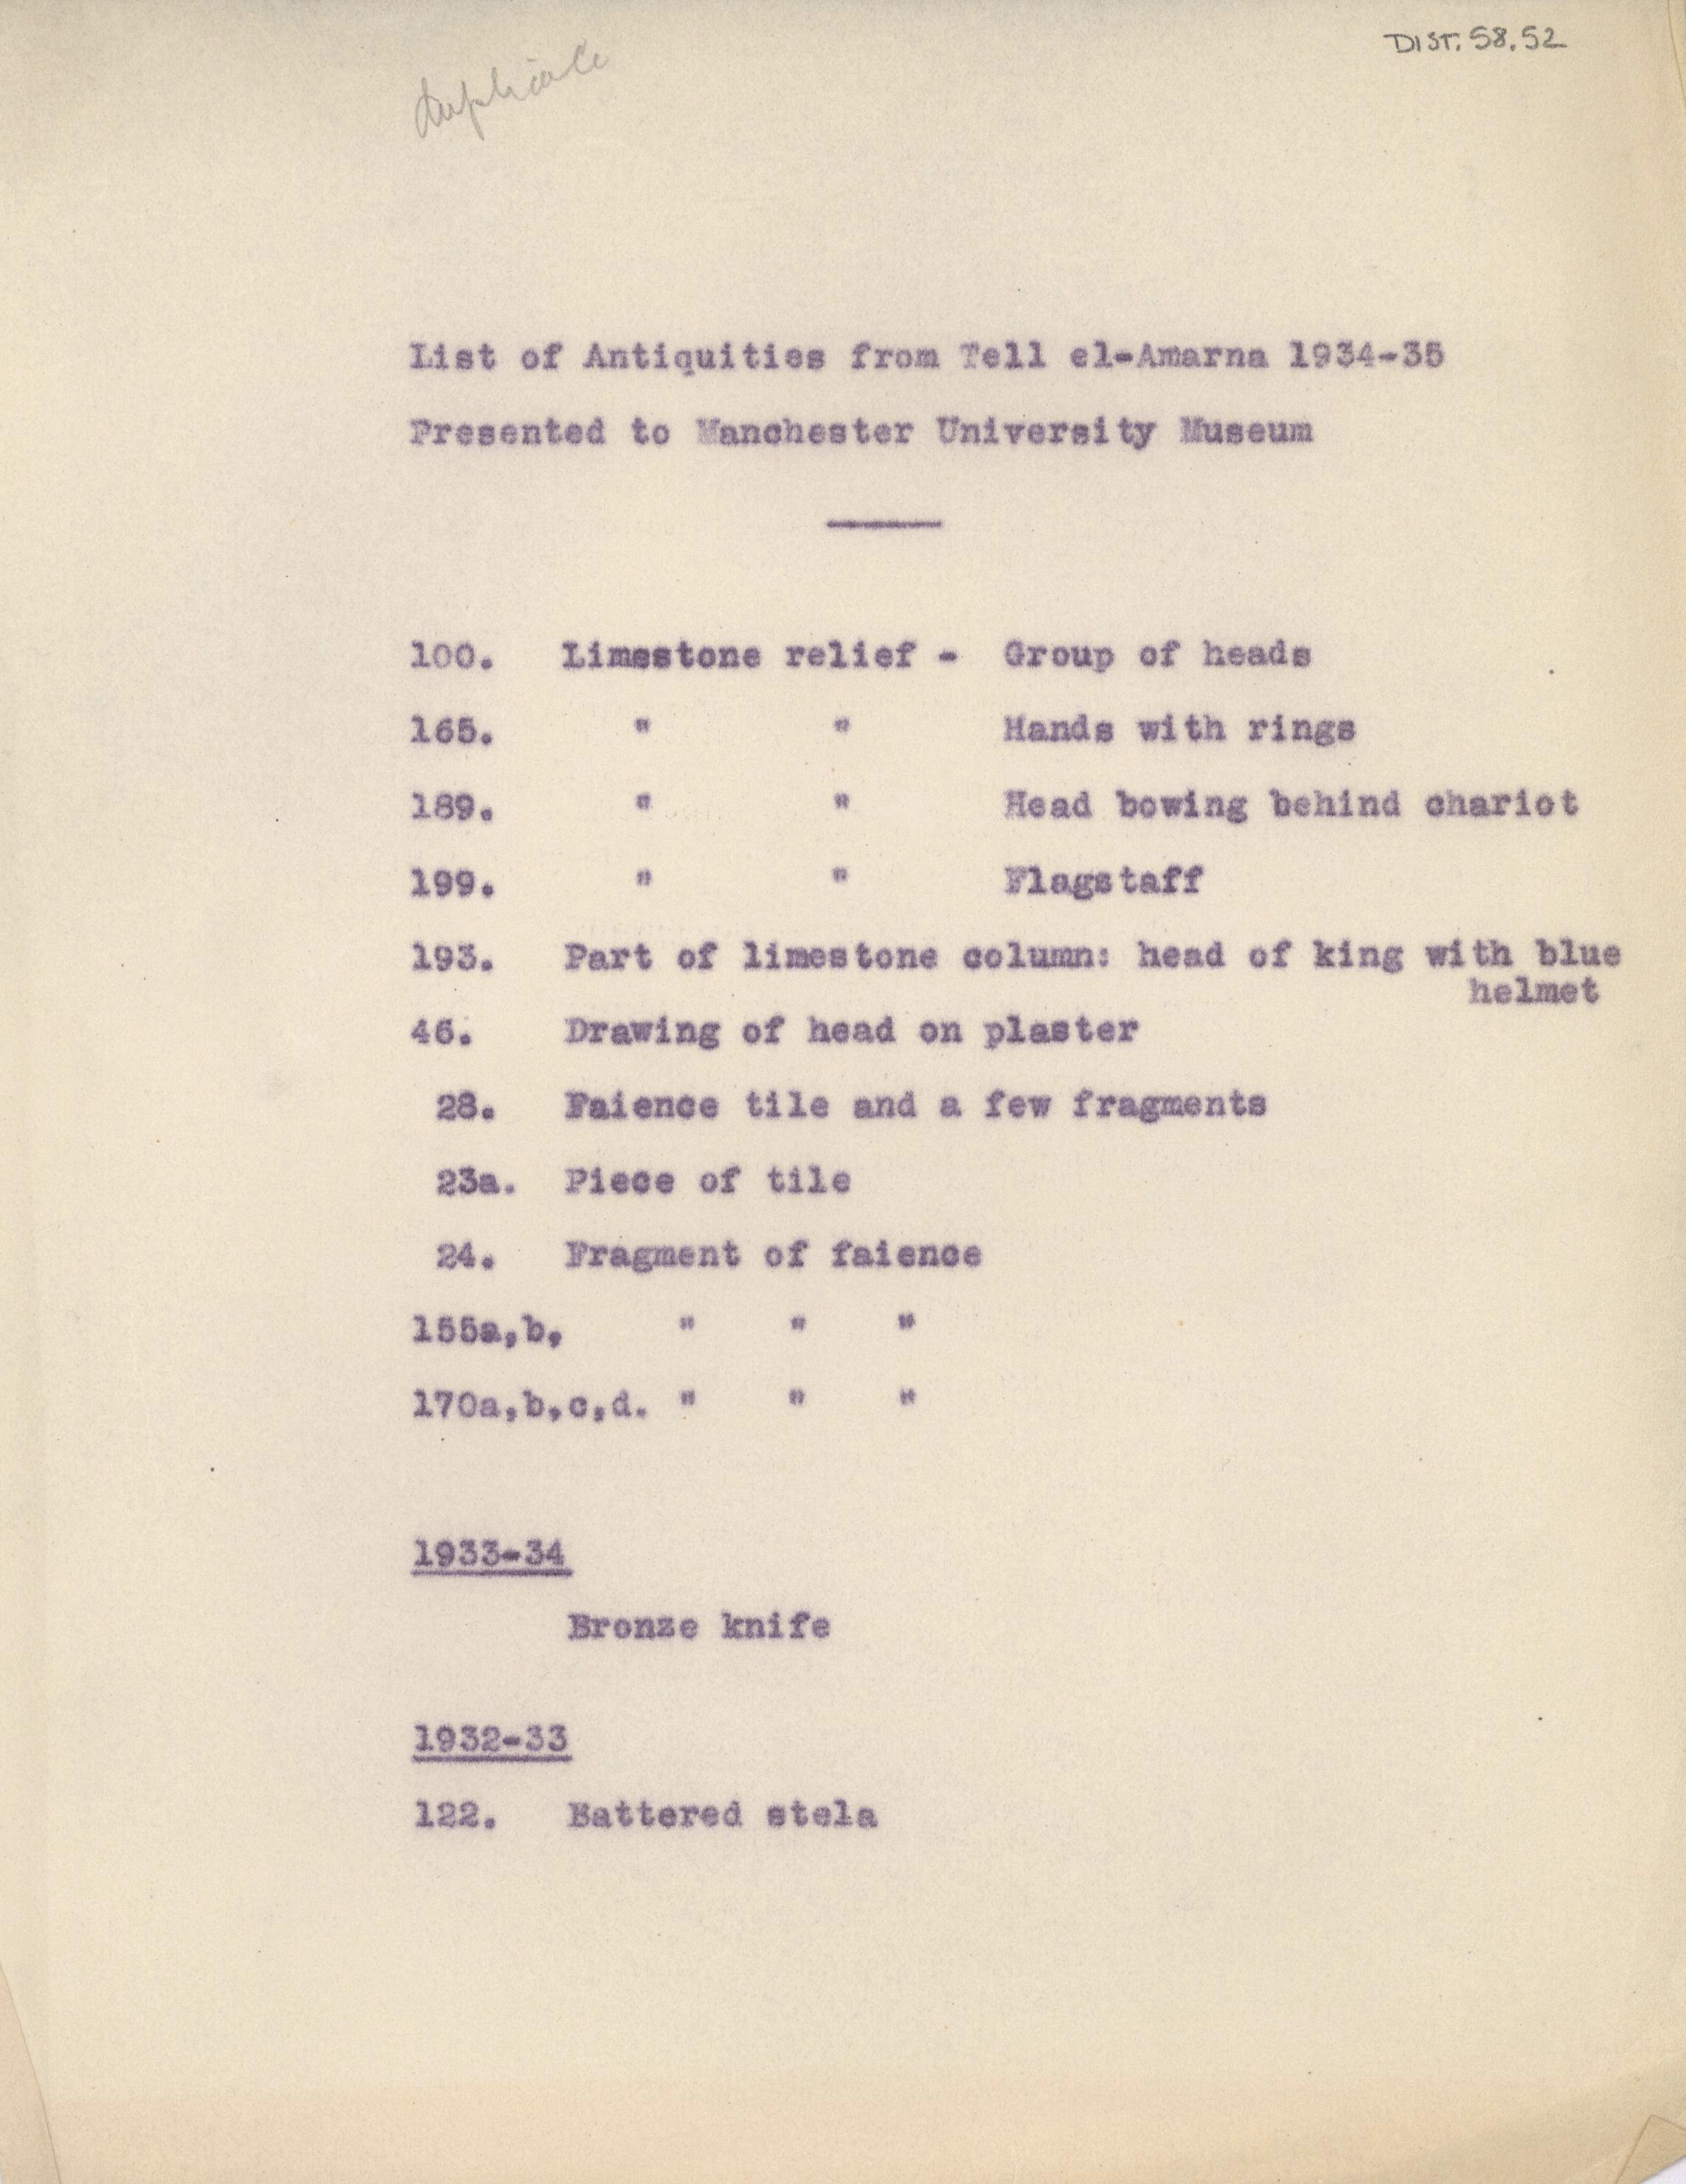 1934-35 el-Amarna DIST.58.52